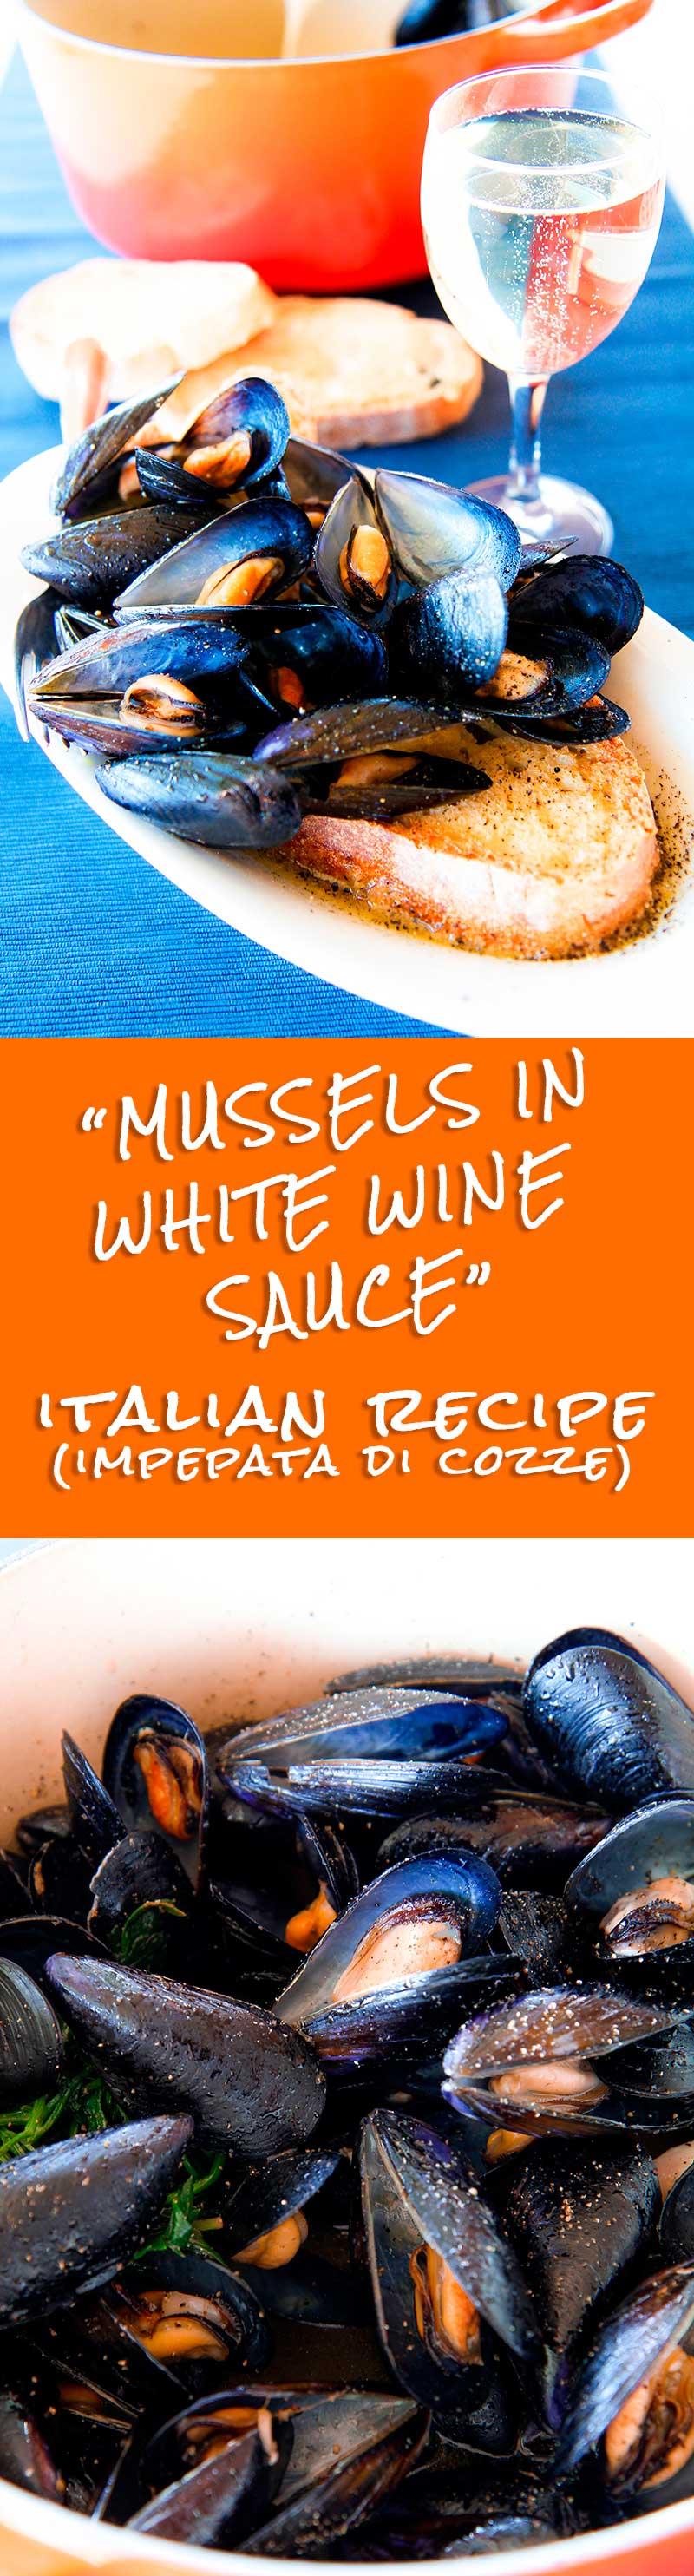 MUSSELS IN WHITE WINE SAUCE Italian recipe (impepata di cozze)